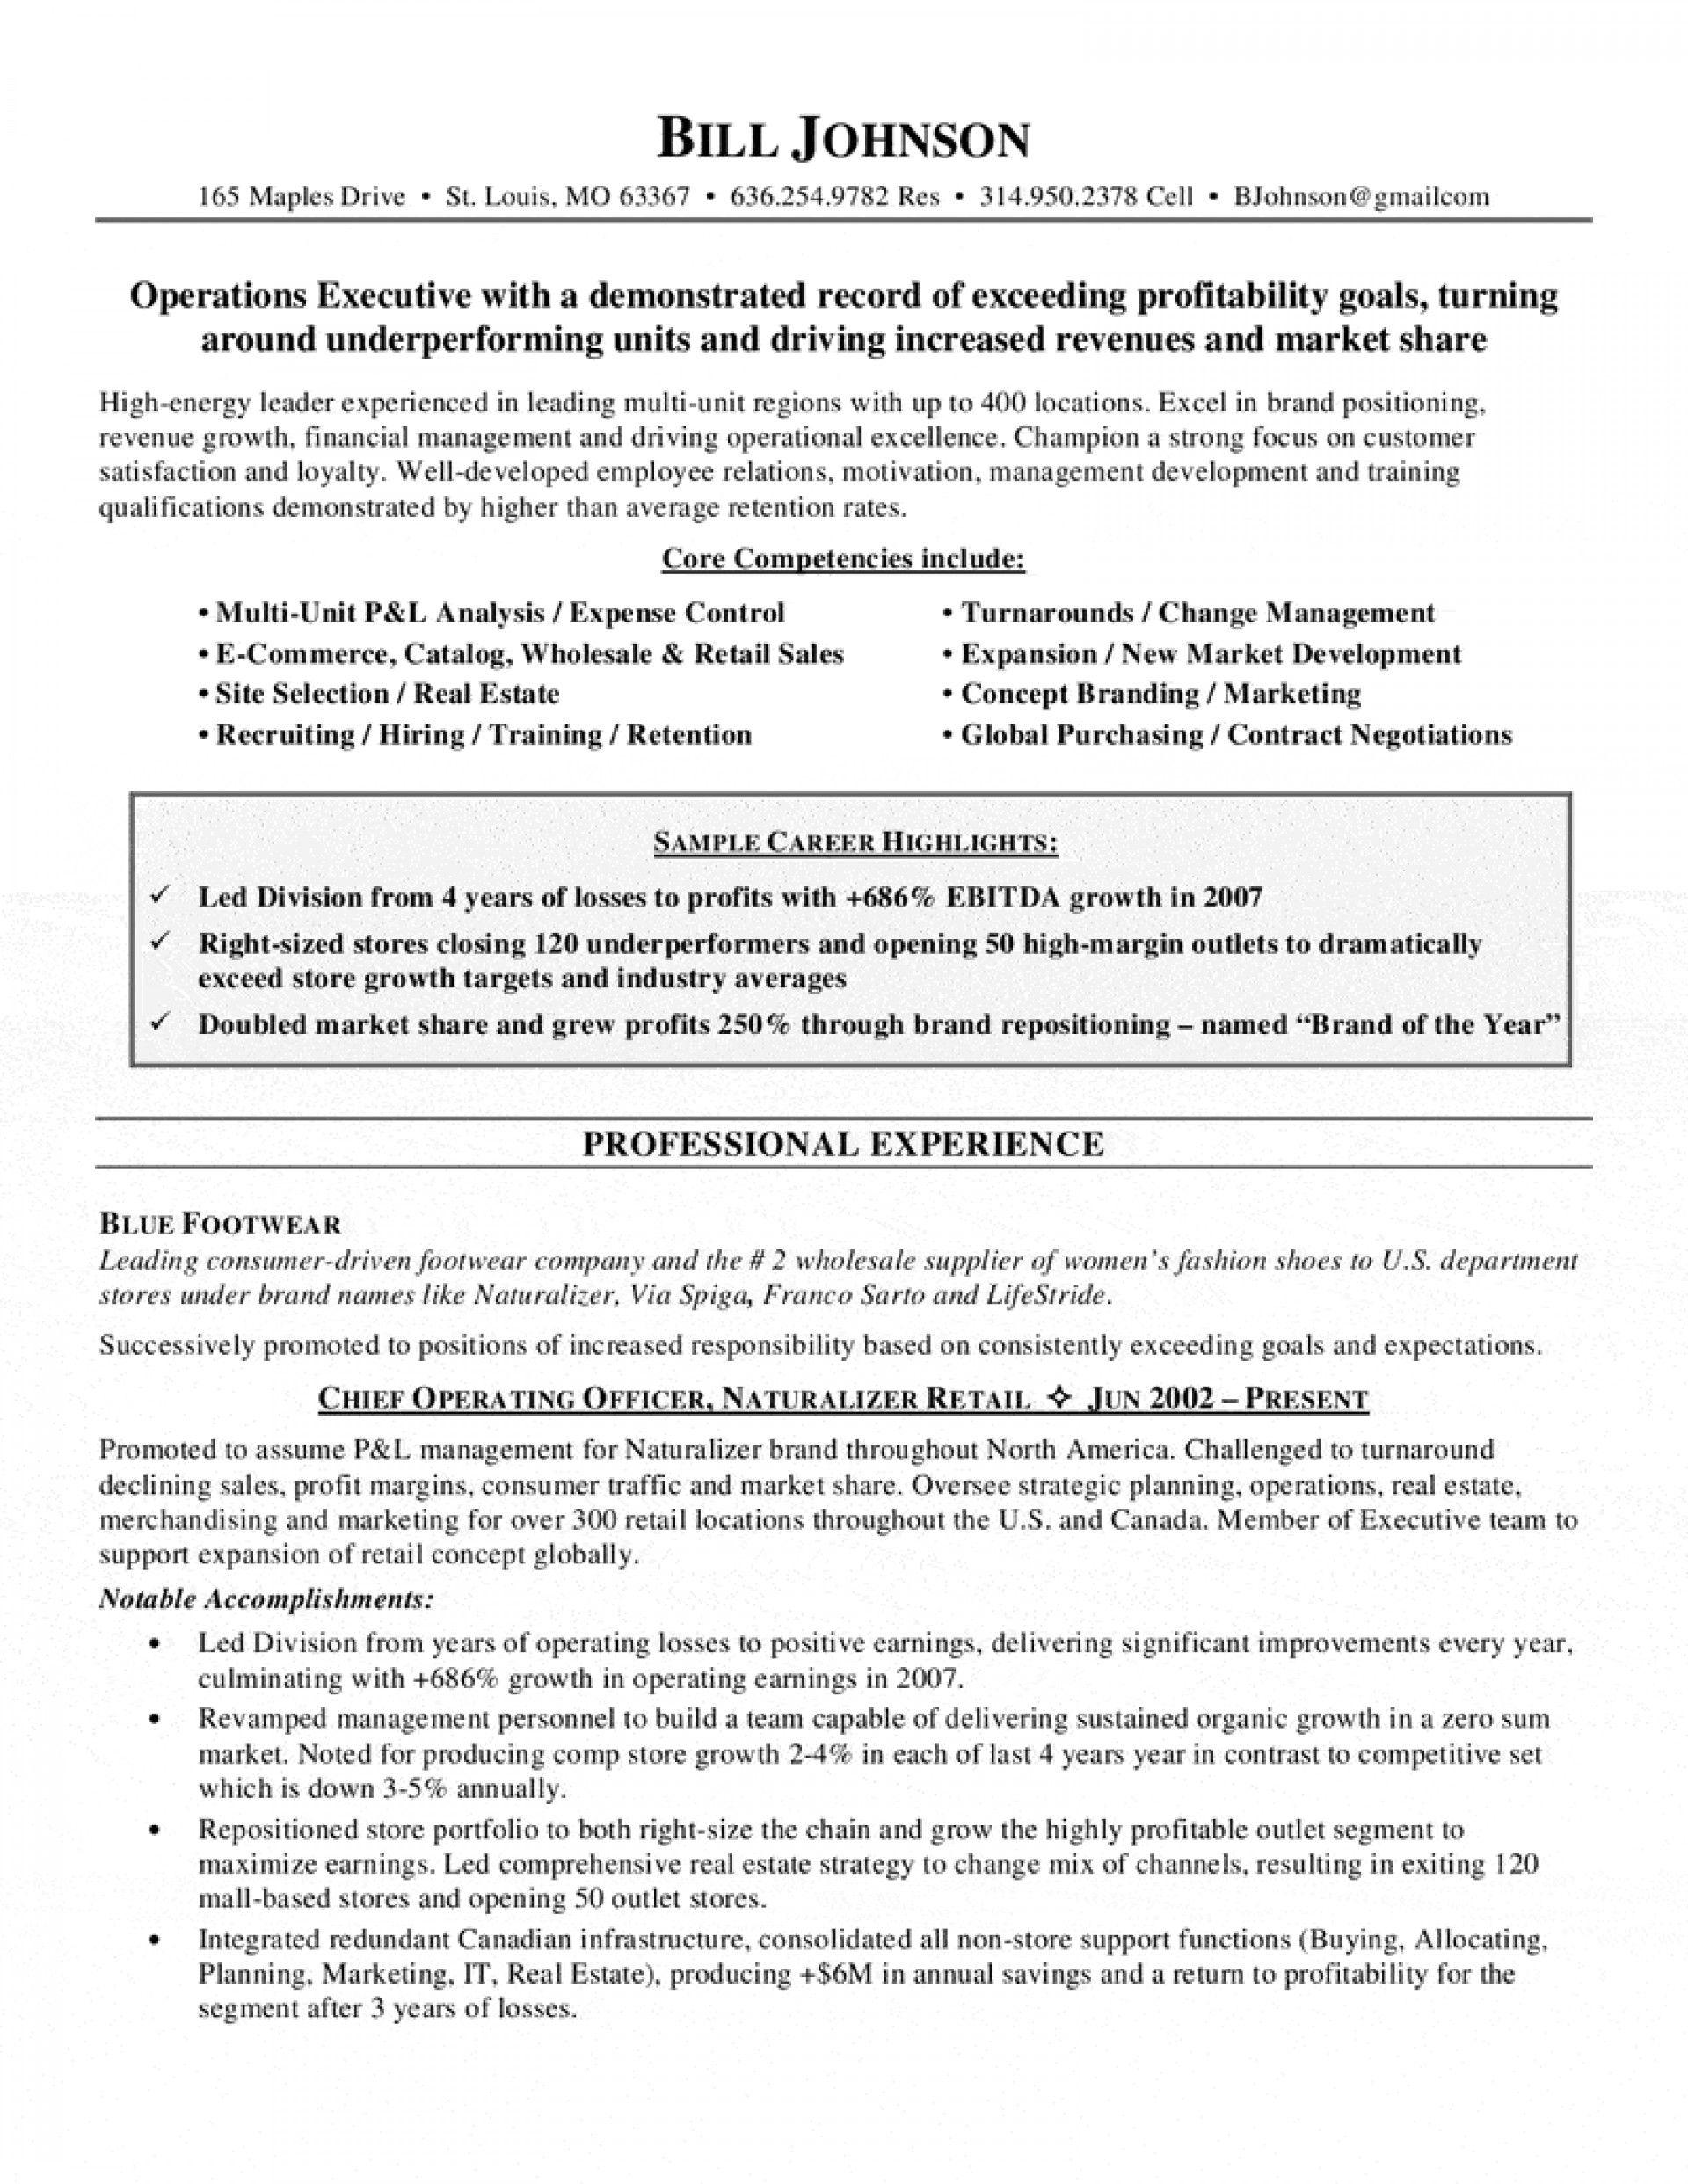 Ecommerce Resume Formats , #ecommerce #formats #resume ...